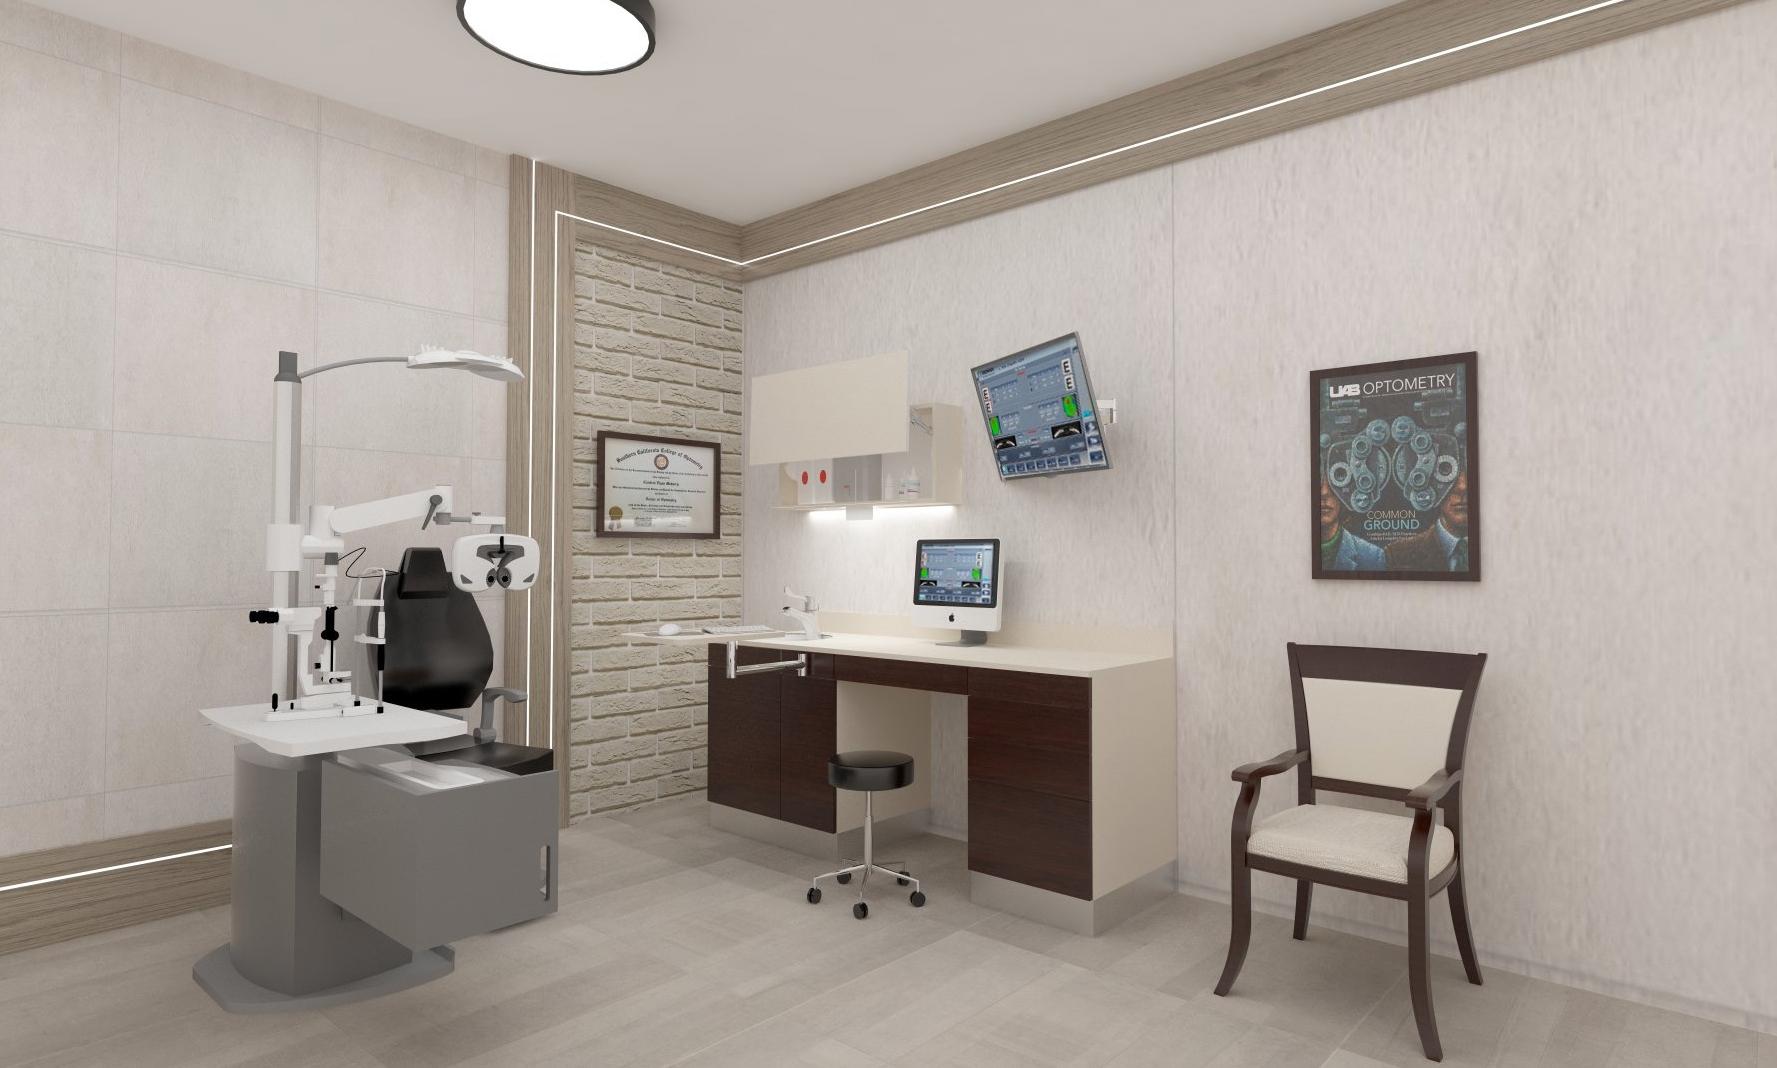 dentoshopGood Vision - 2 Exam Room - 08.jpg